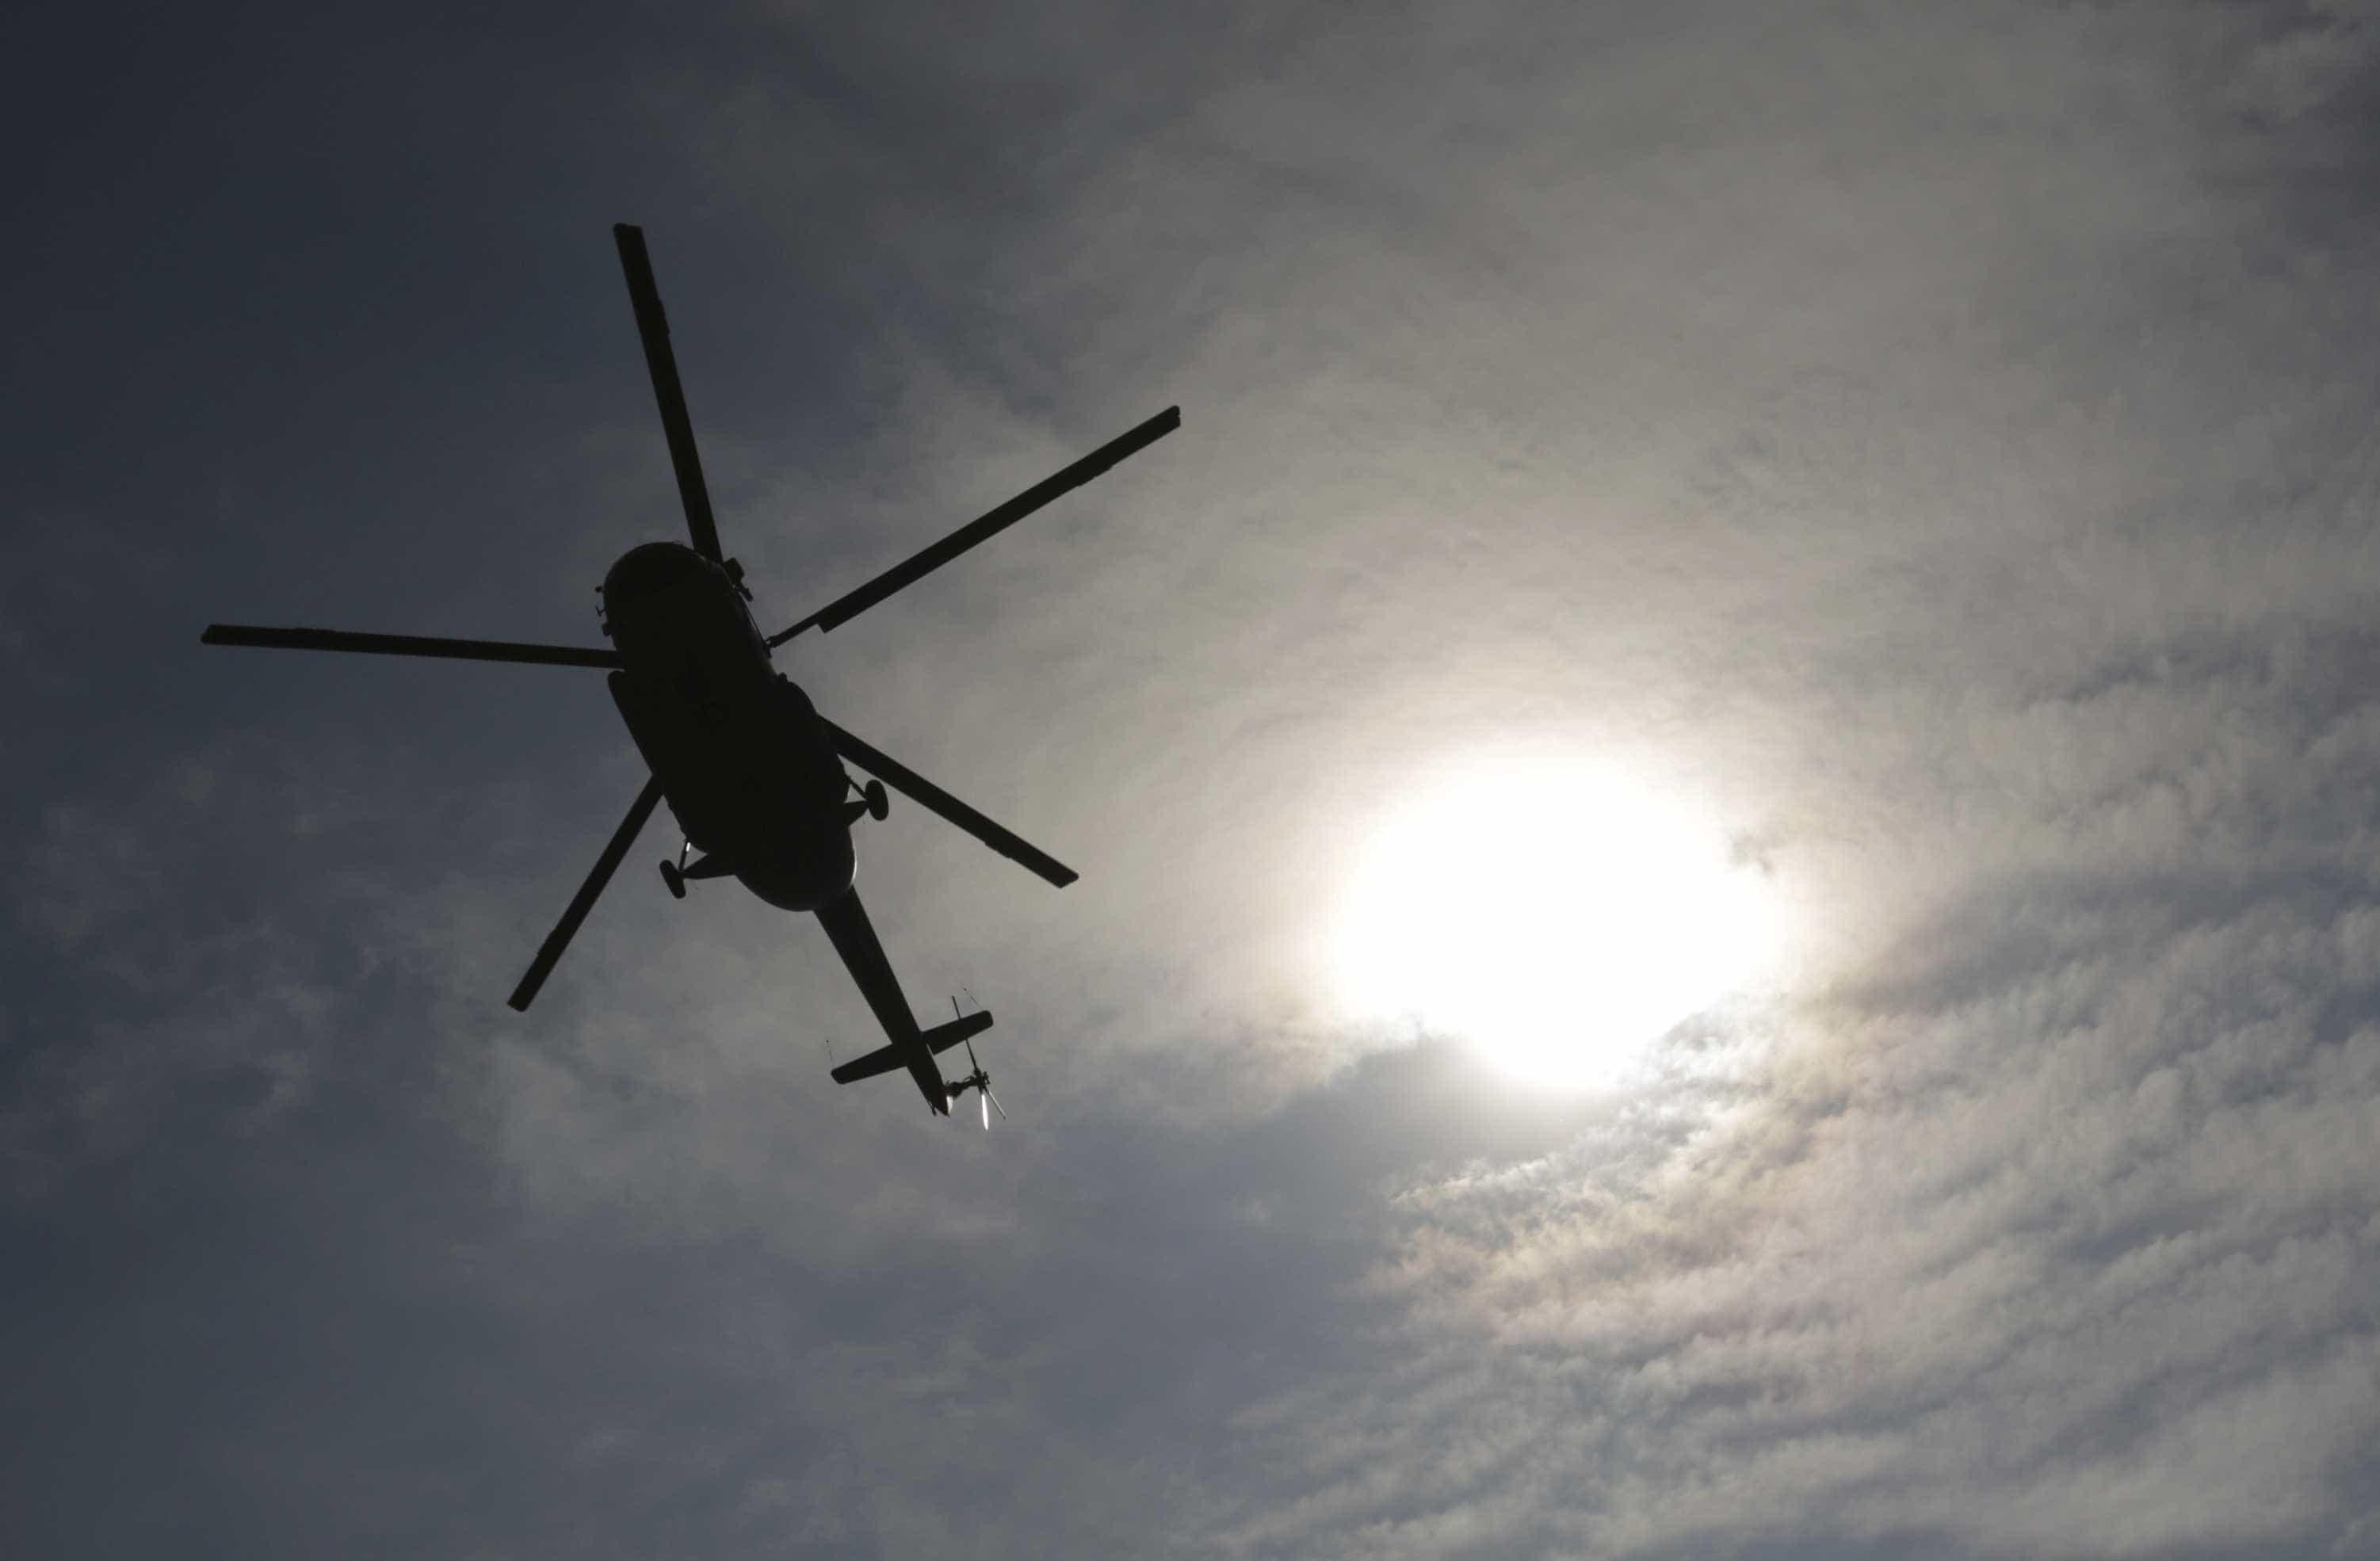 Queda de helicóptero deixa quatro mortos nos Emirados Árabes